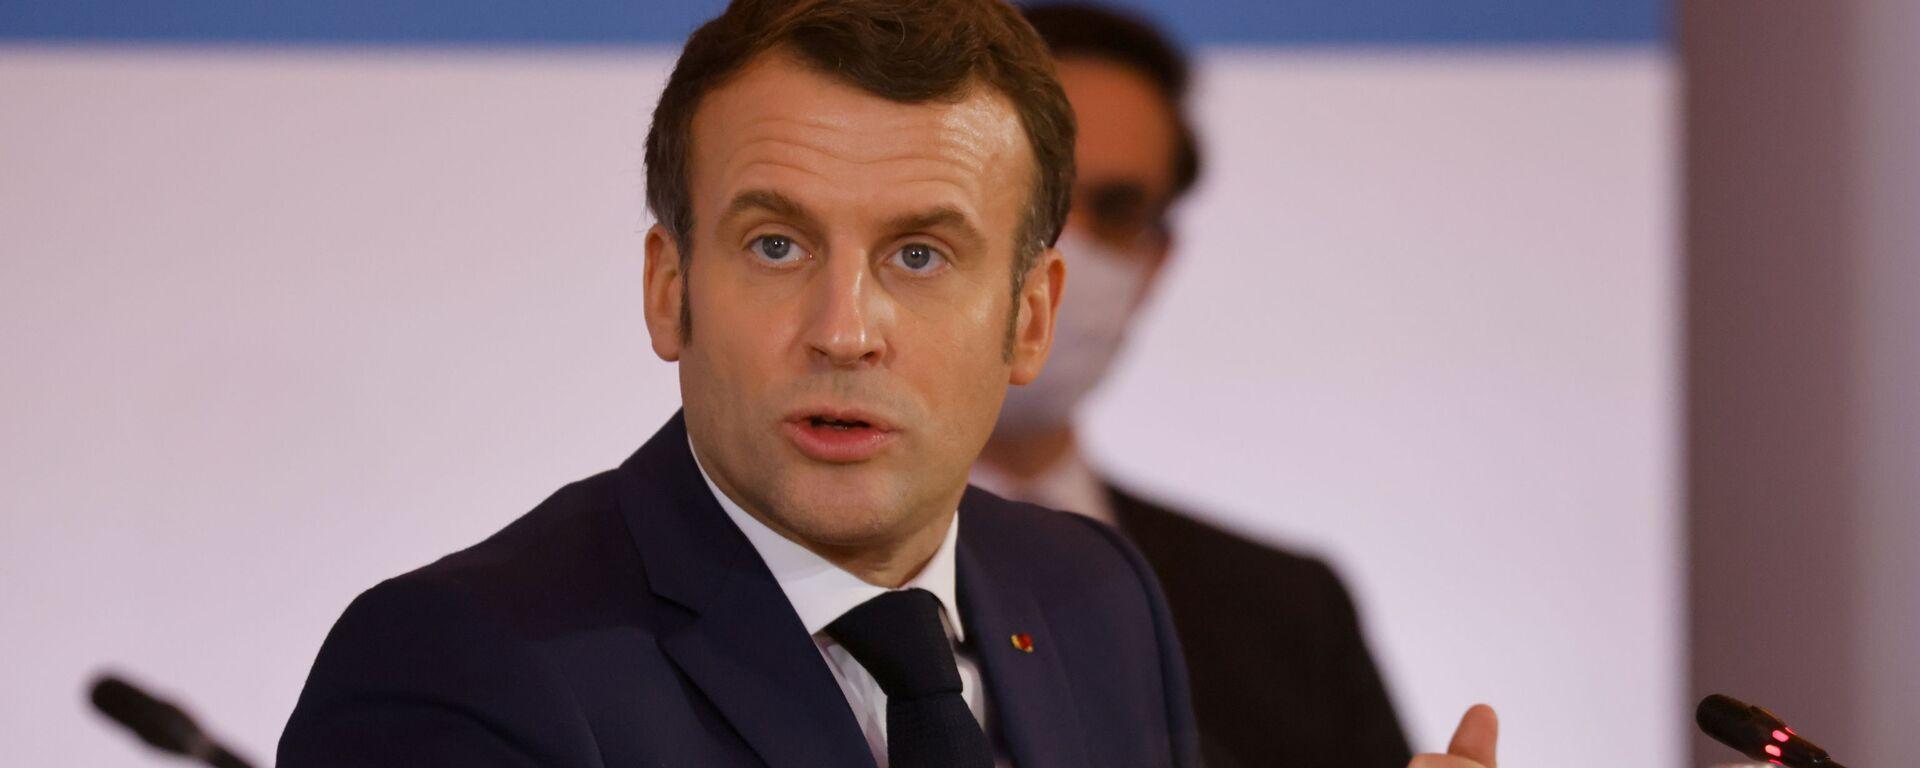 Emmanuel Macron, el presidente de Francia - Sputnik Mundo, 1920, 08.06.2021